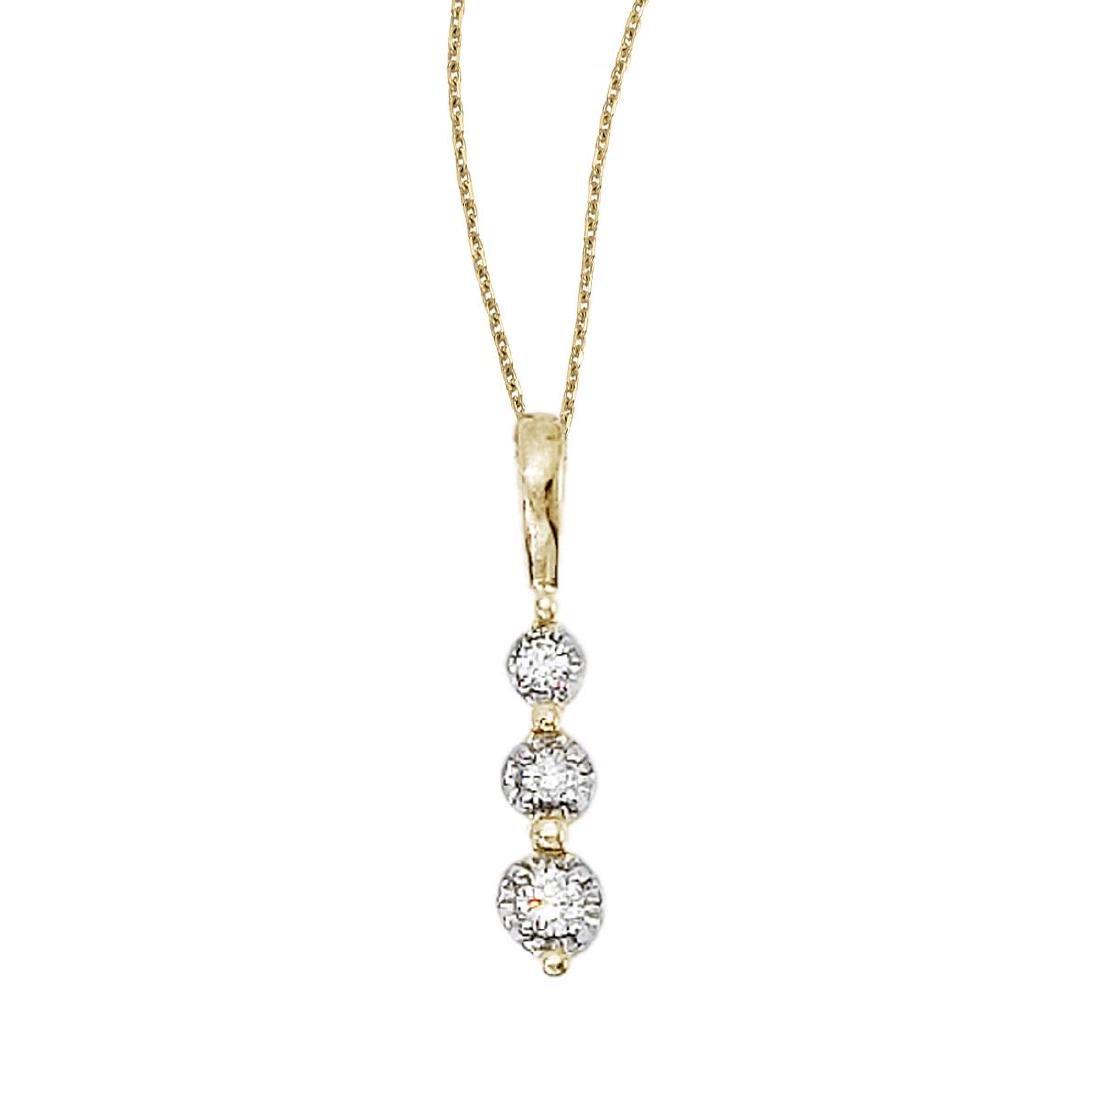 Certified 14k Yellow Gold 3 Stone Diamond Drop Pendant